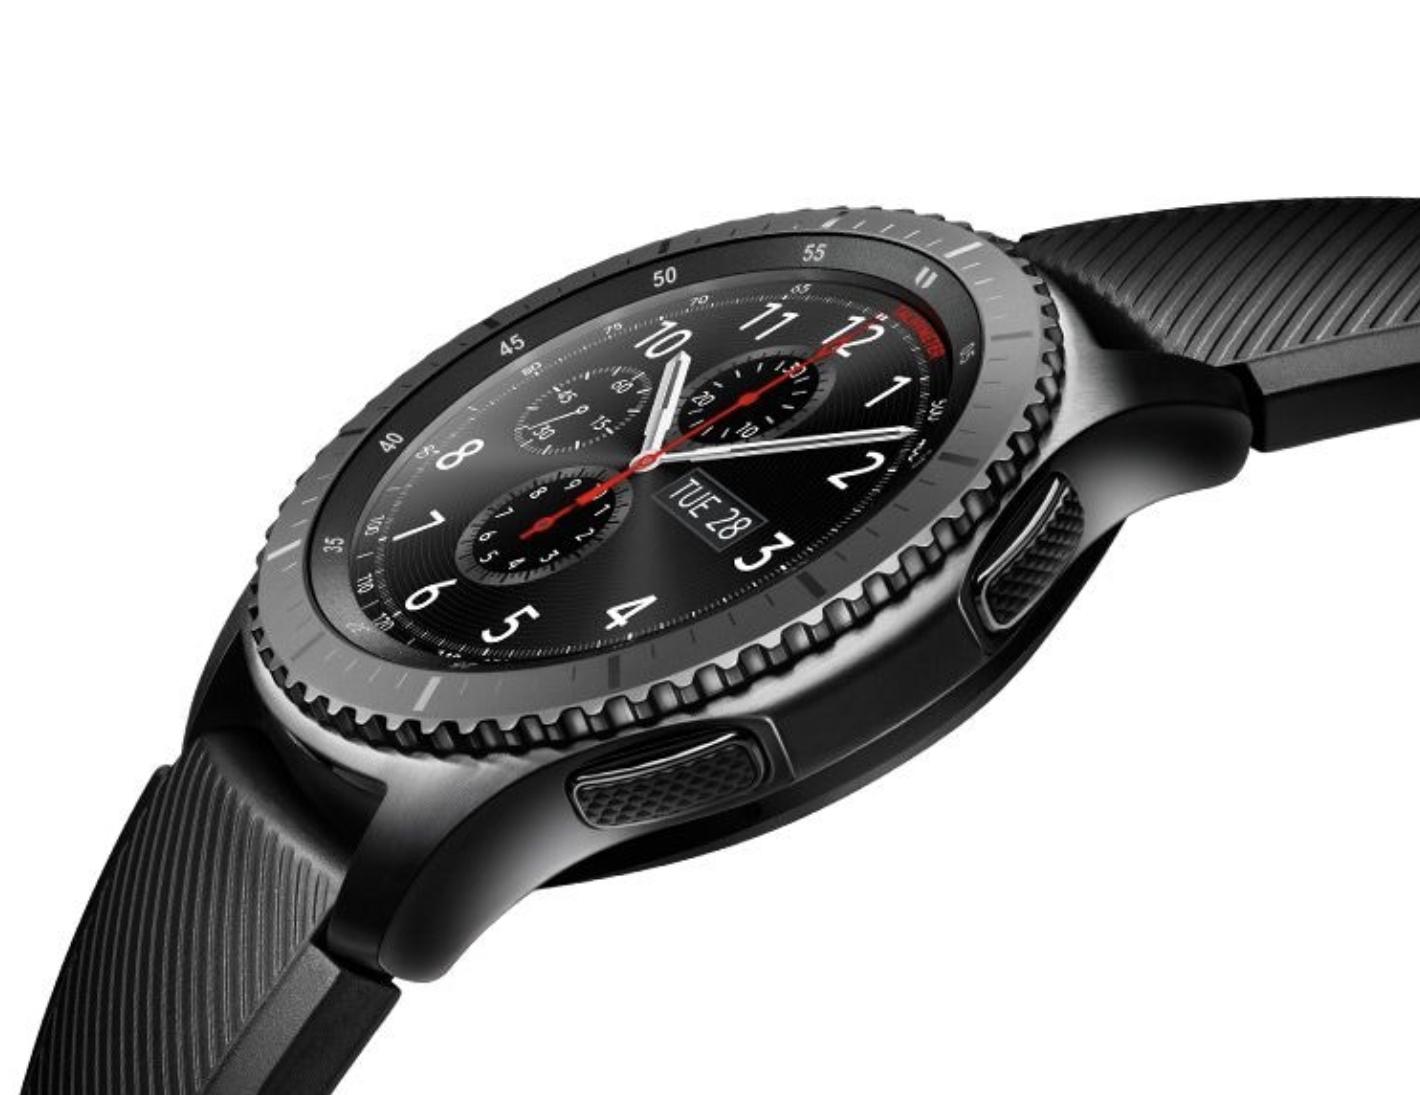 samsung gear s3 frontier smartwatch 46mm f r 179 plus 13 35 ber payback m glich ab. Black Bedroom Furniture Sets. Home Design Ideas